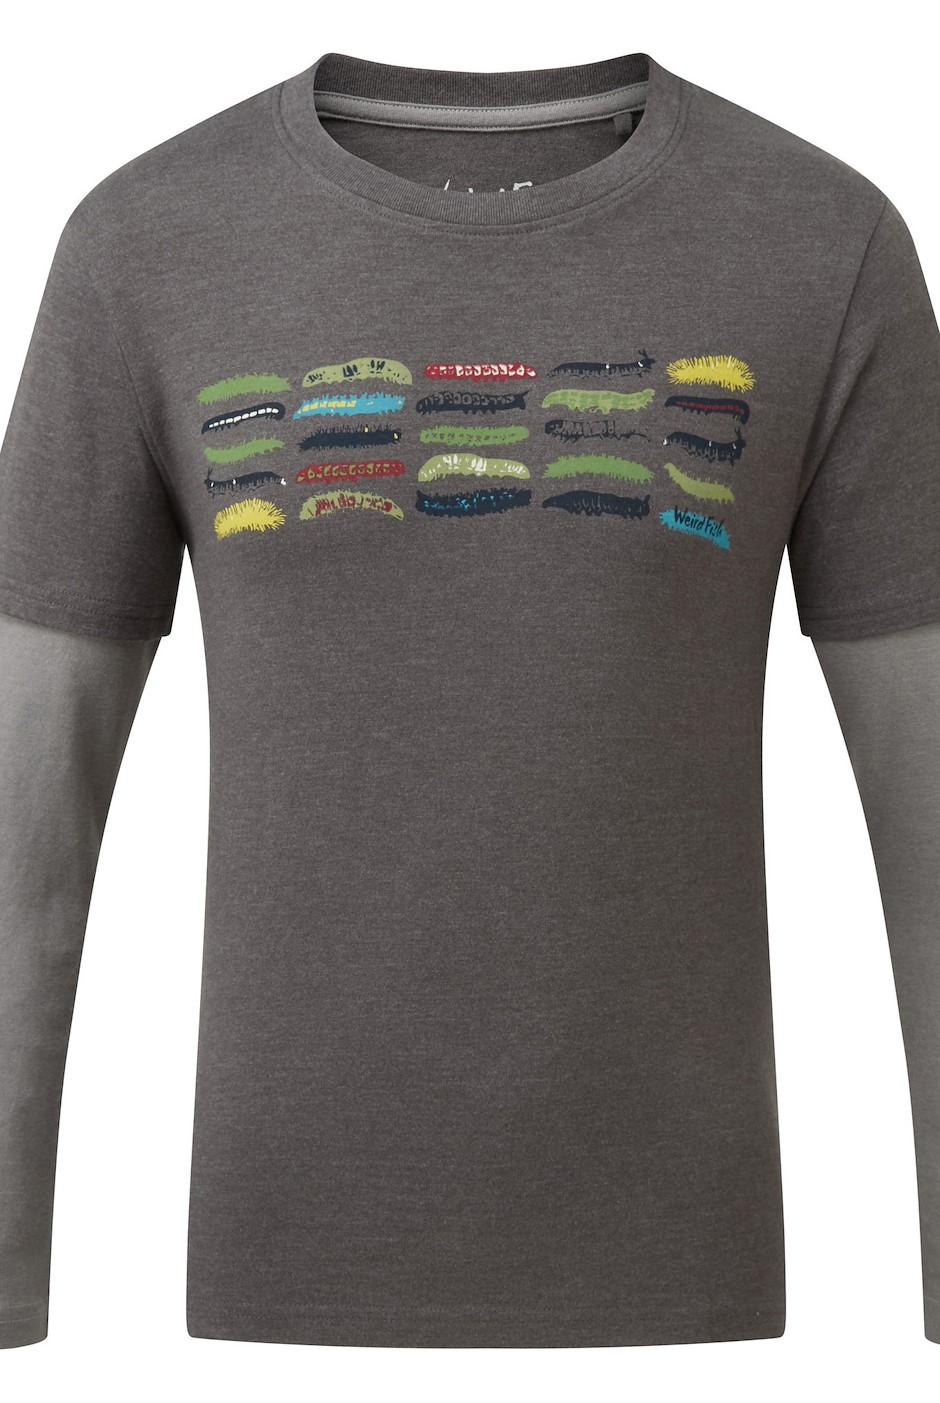 Caterpillars Long Sleeved Graphic T-Shirt Gunmetal Marl